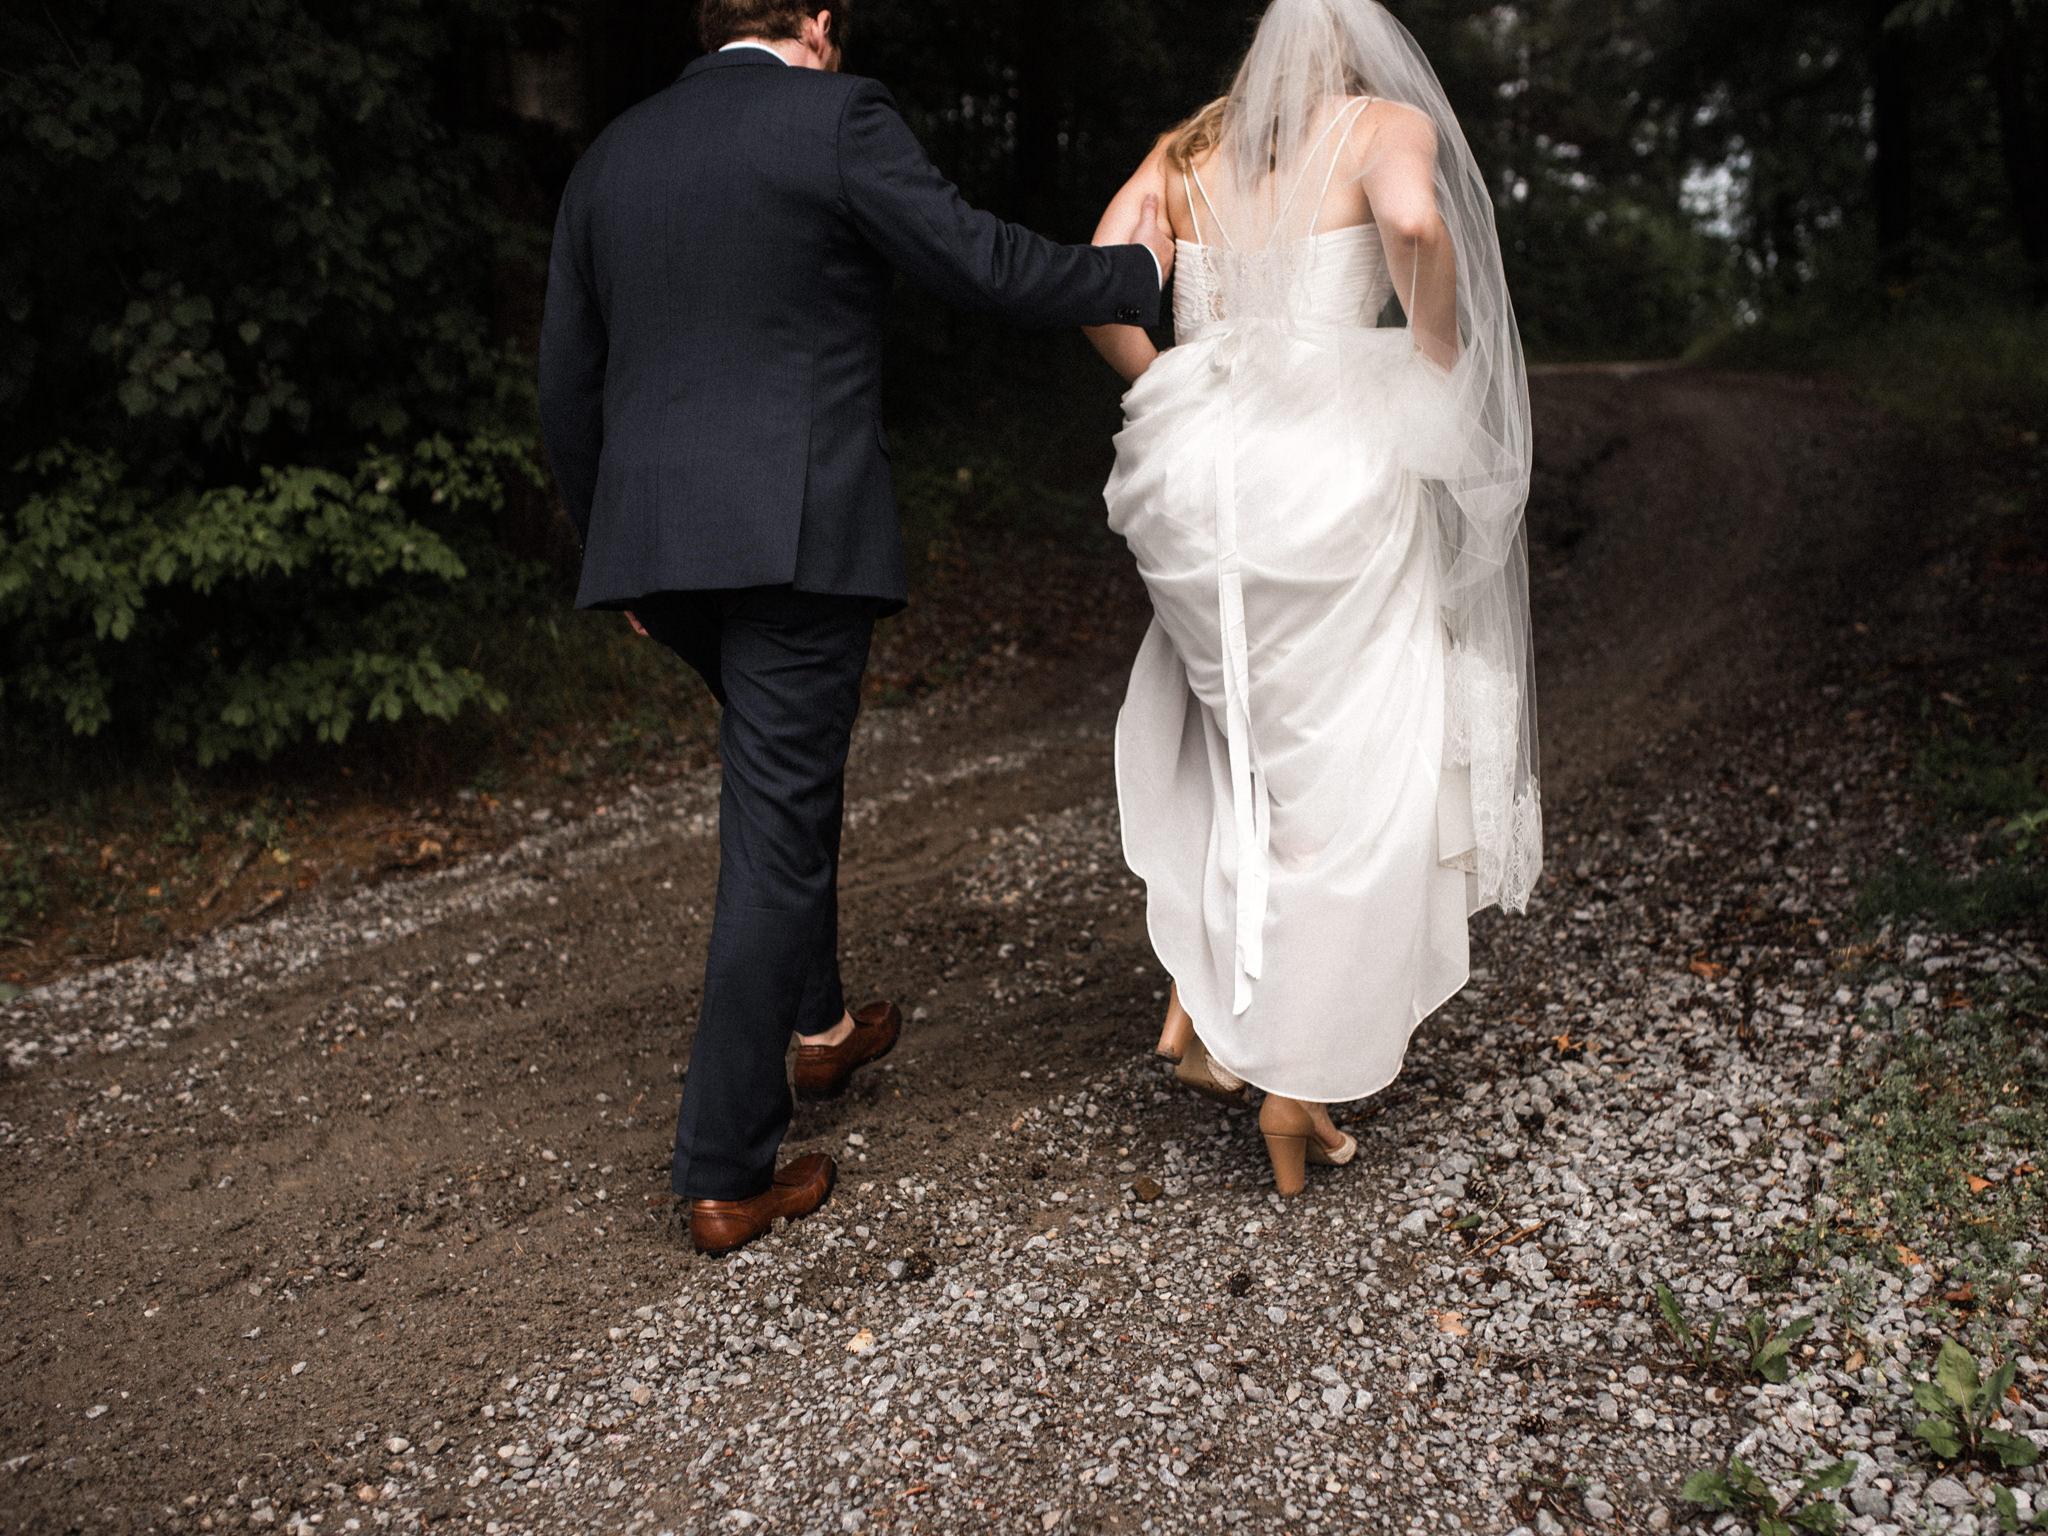 skyloft-wedding-toronto-wedding-photographer-41.jpg